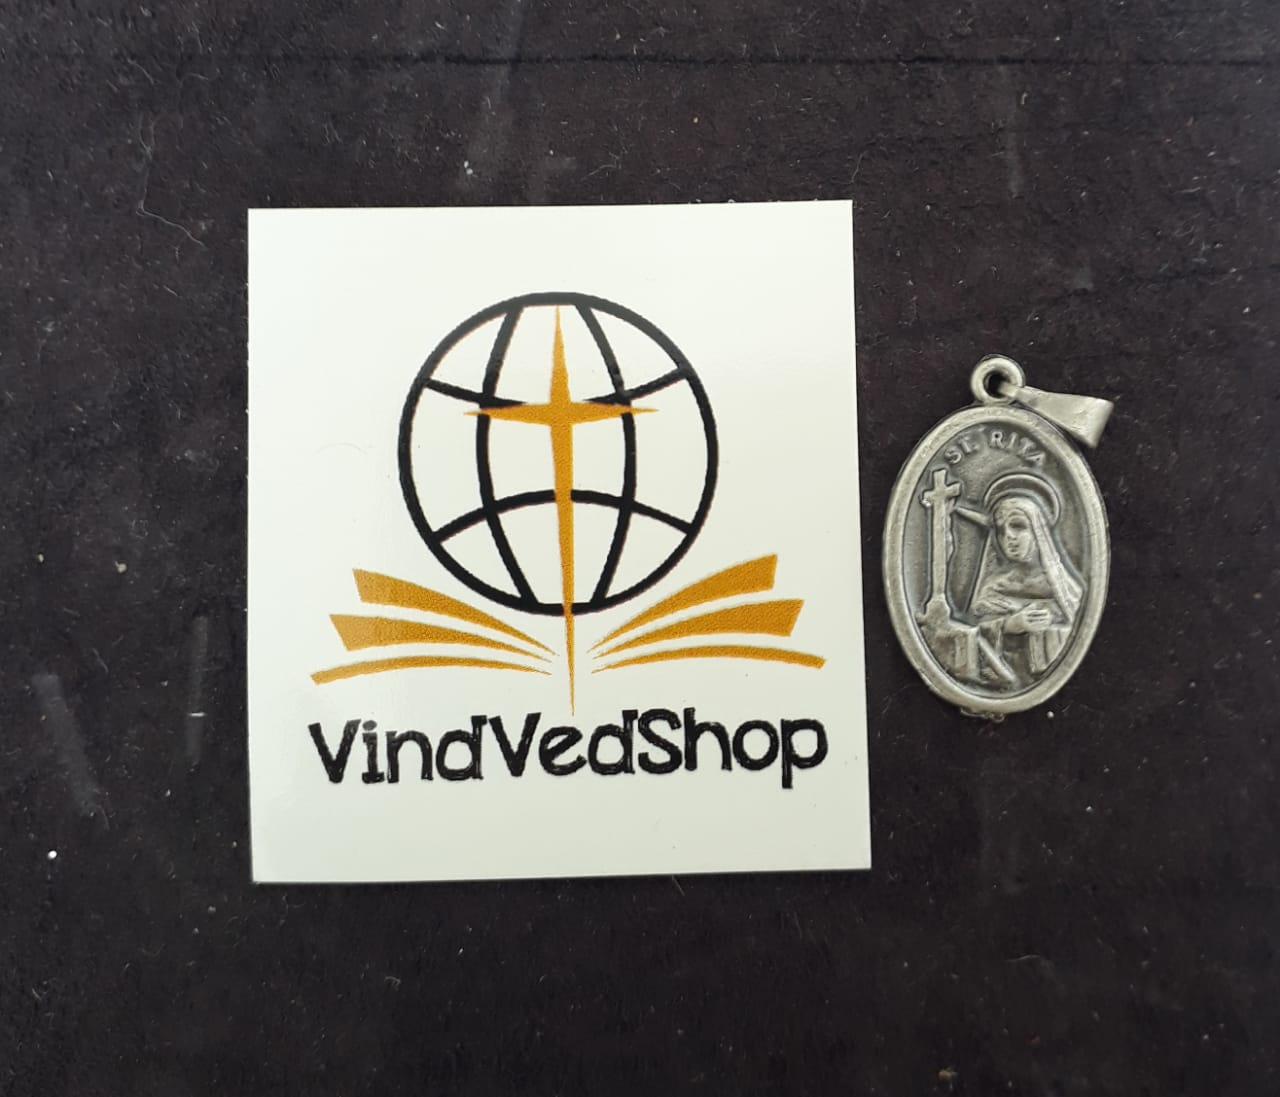 M27 - Medalha Santa Rita de Cássia 20mm Prata Velha  - VindVedShop - Distribuidora Catolica